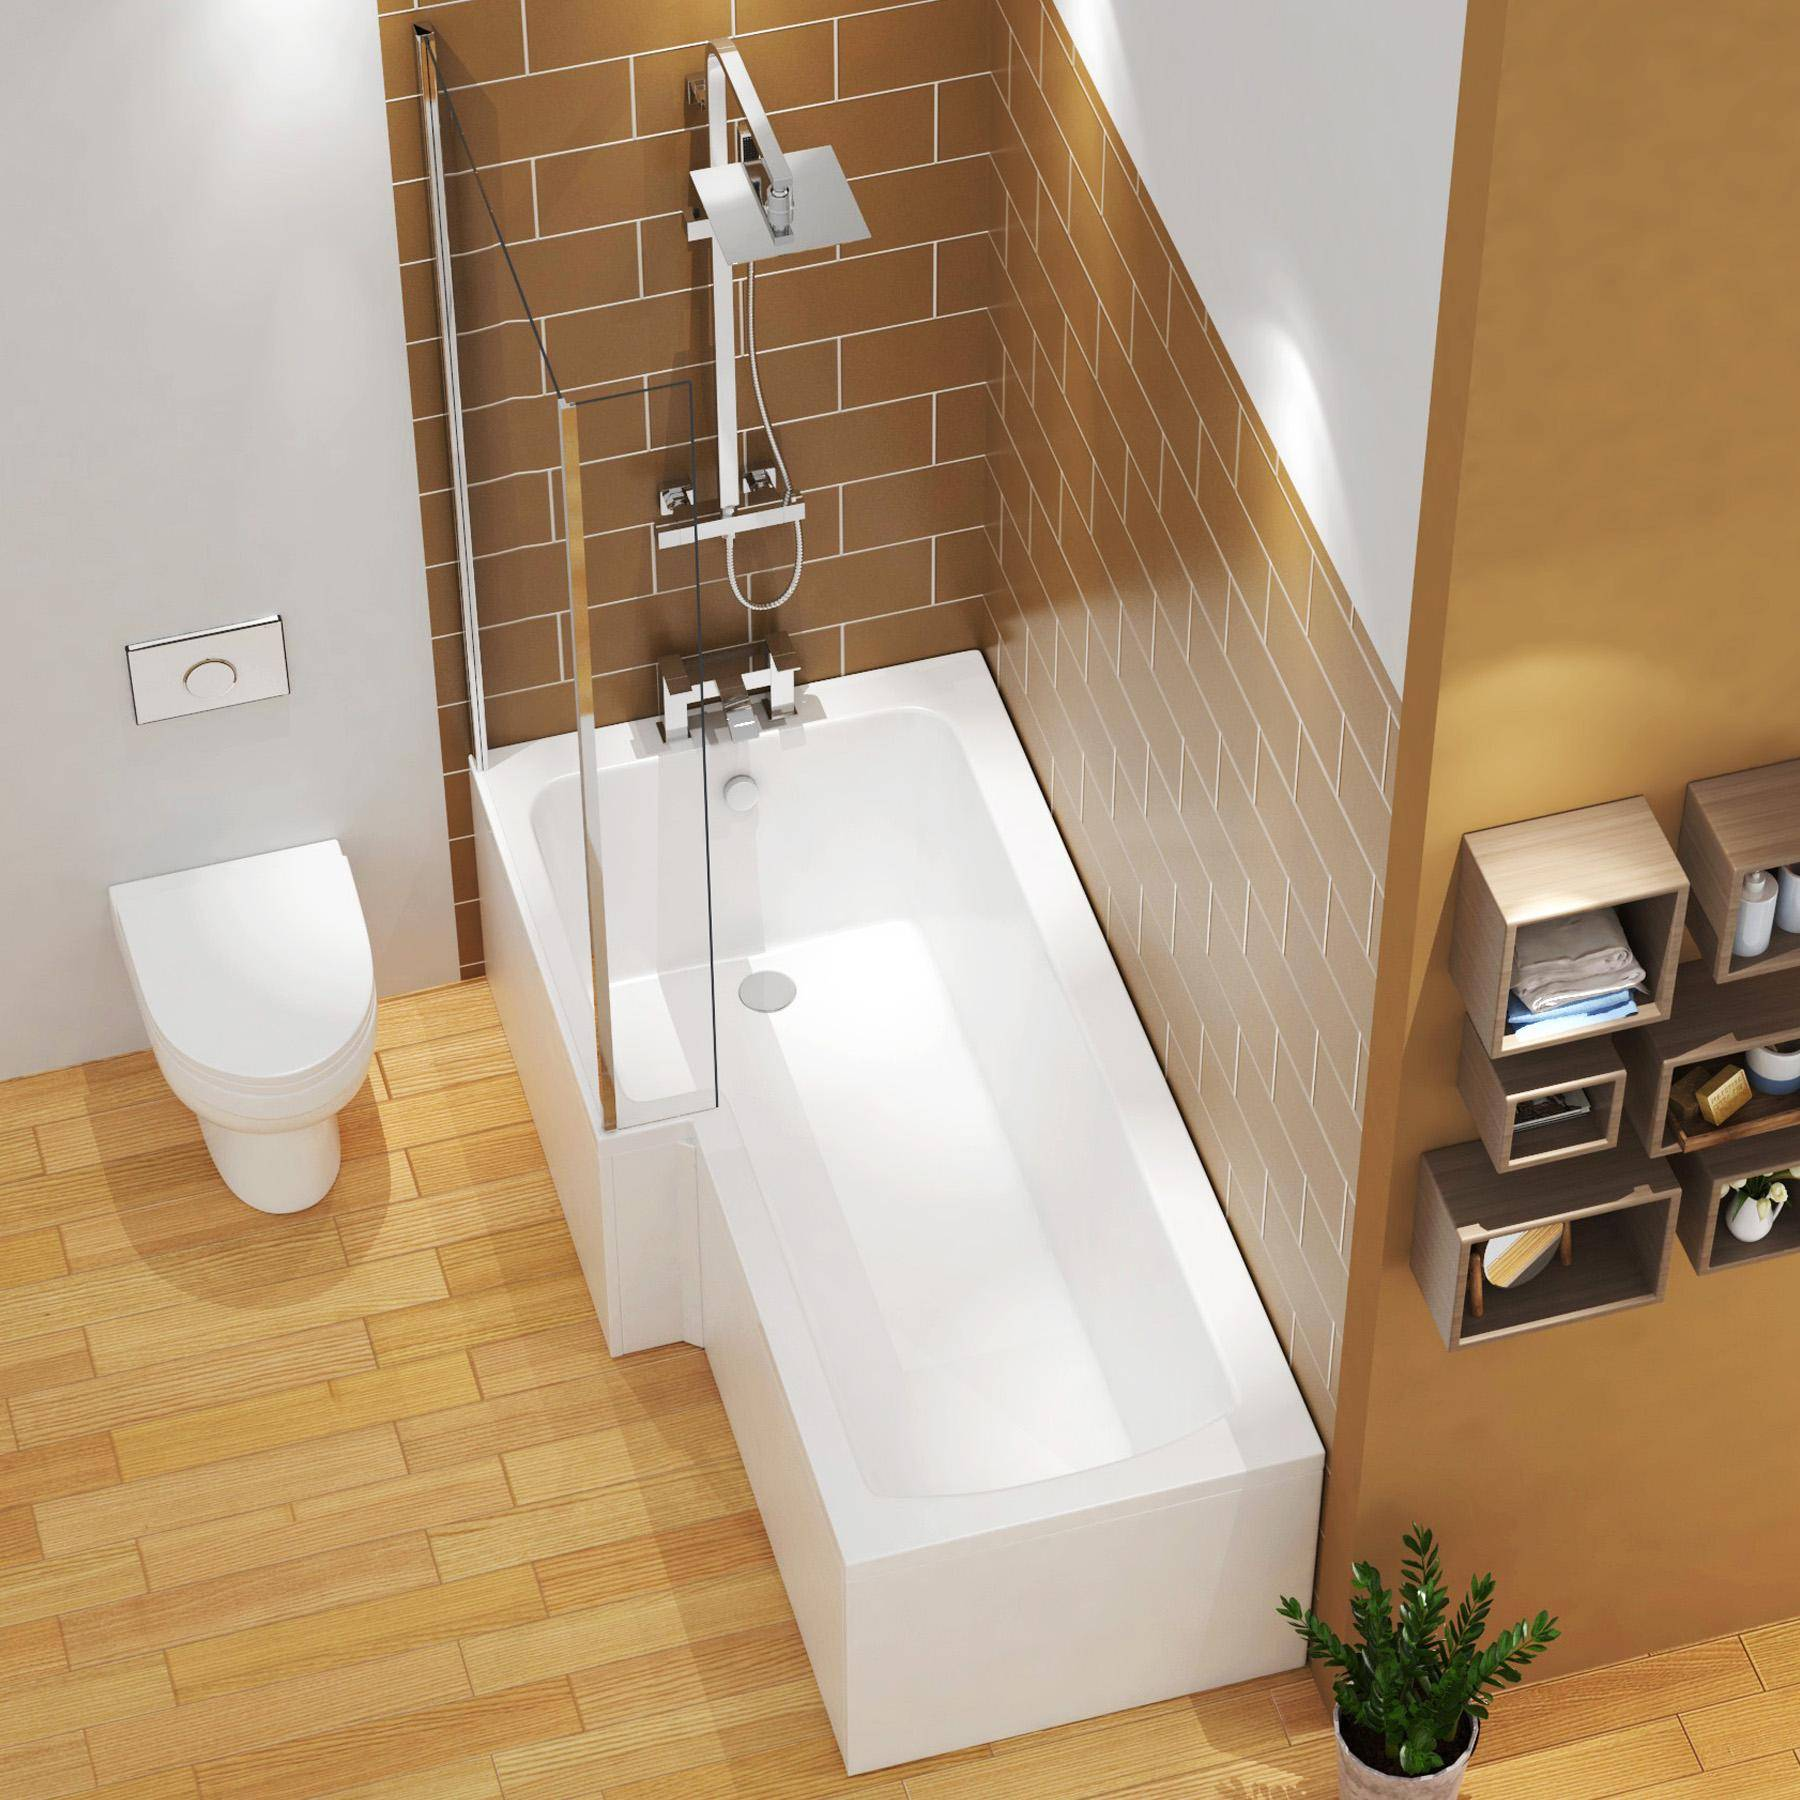 Royal Bathrooms Qubix 1600 x 850mm Left Hand L Shaped Shower Bath tub with MDf Front, End Panel & Shower Screen